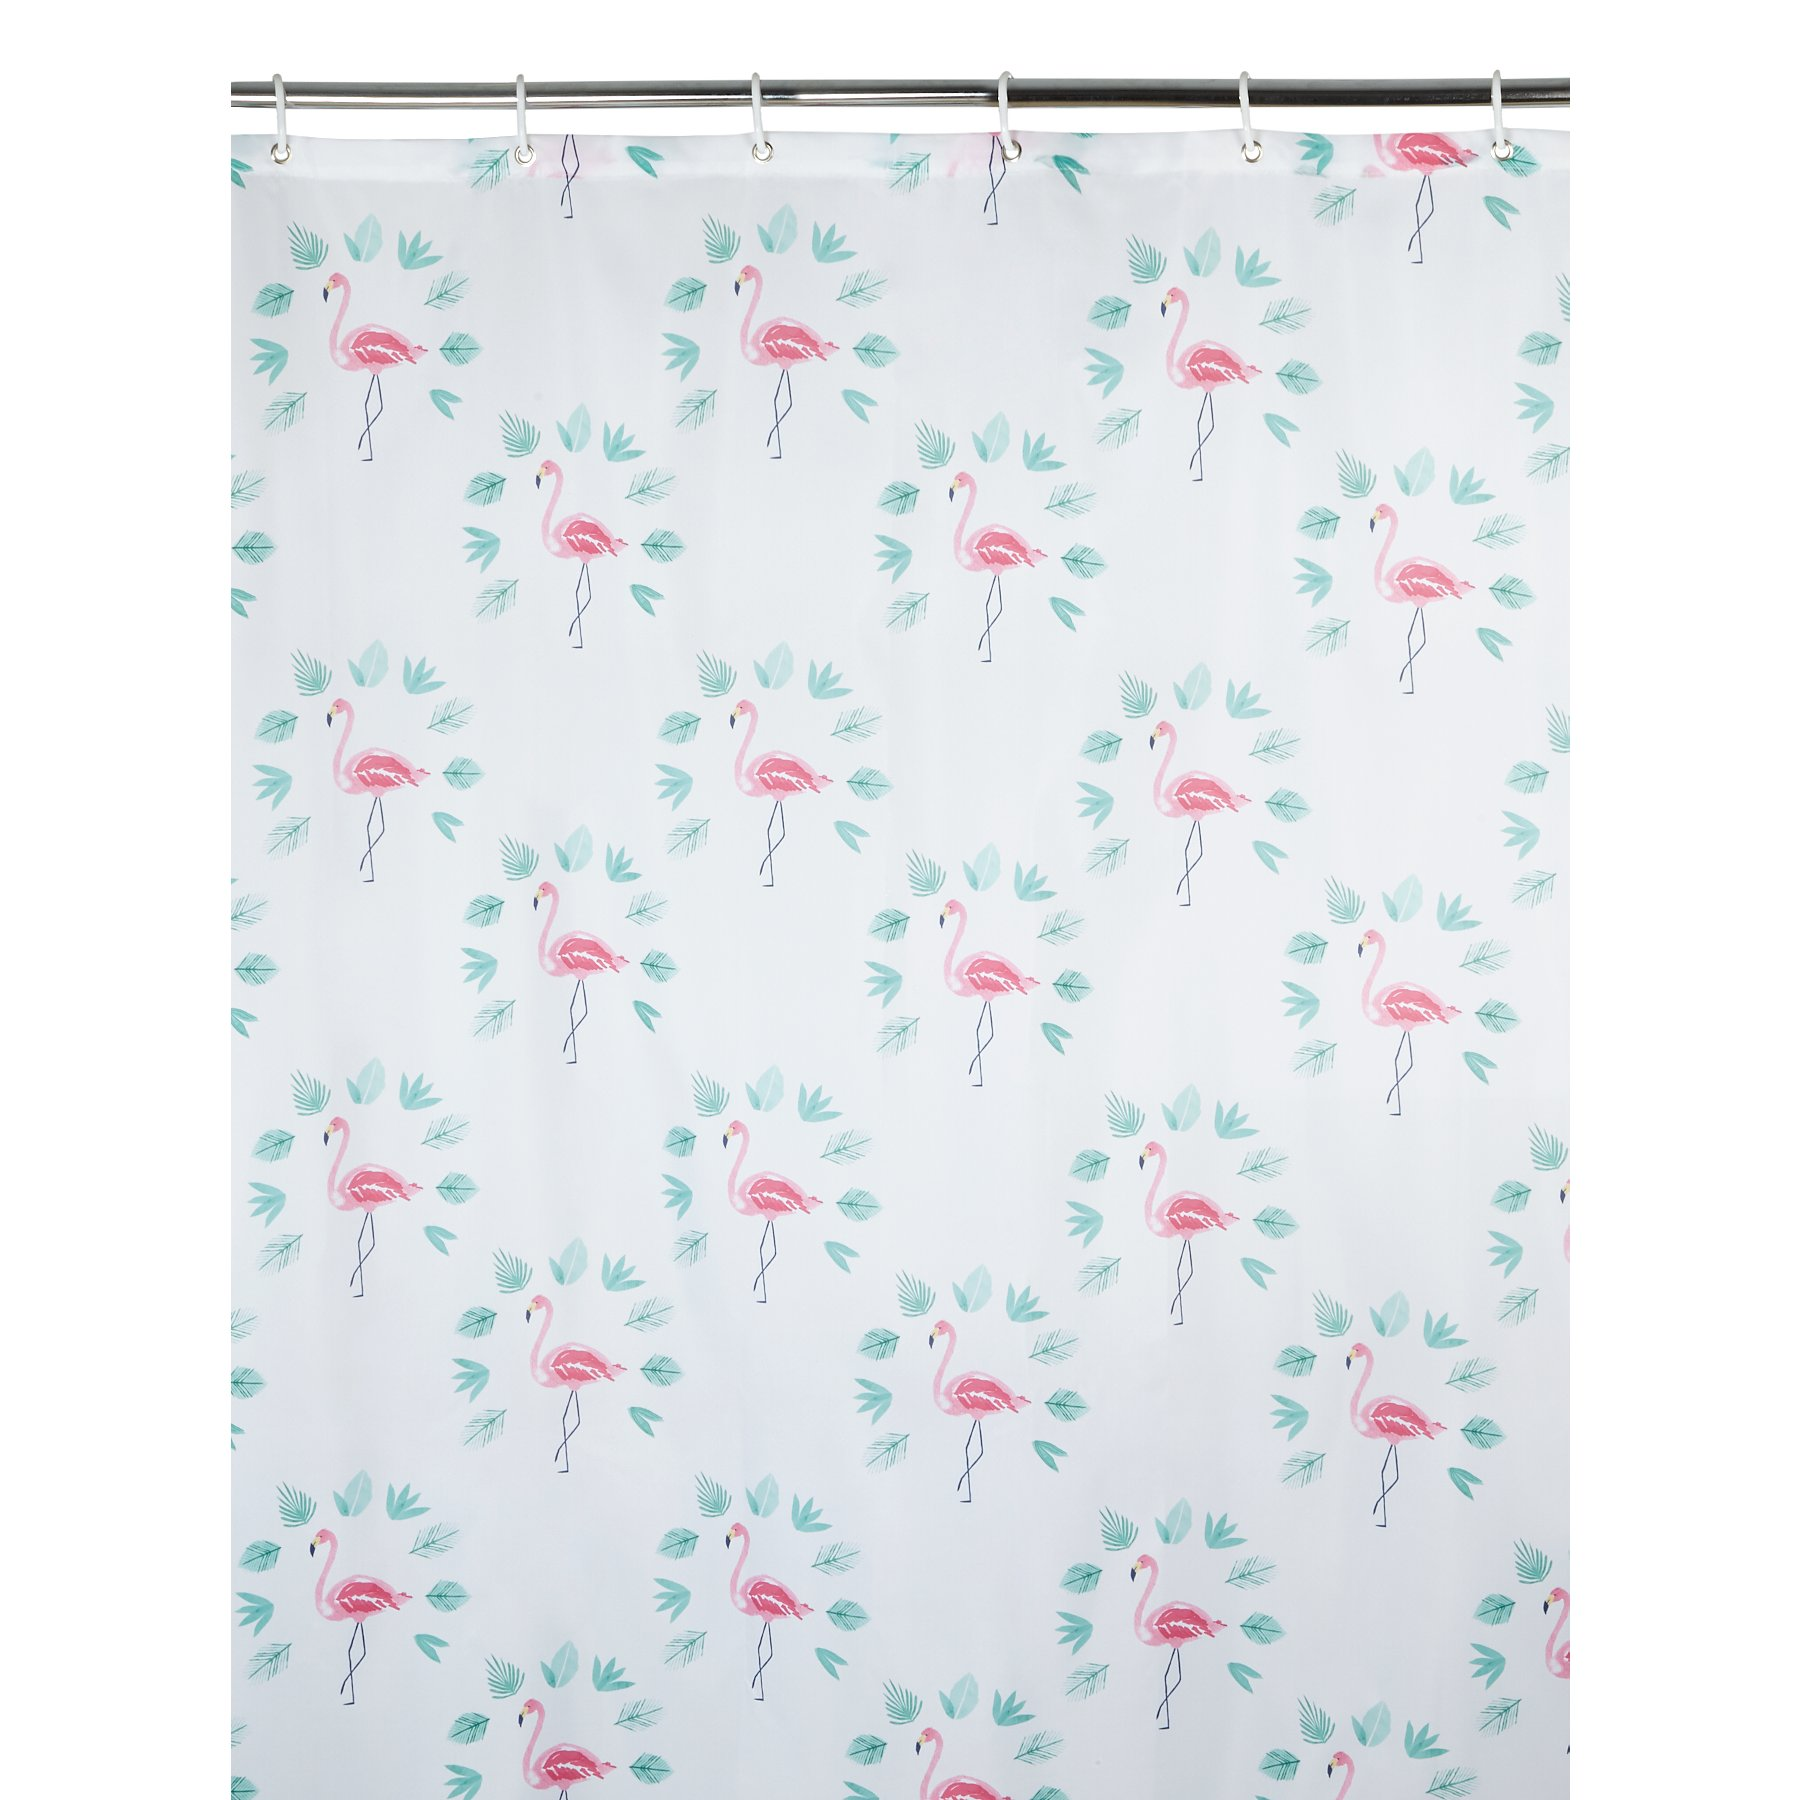 Flamingo Palm Print Shower Curtain